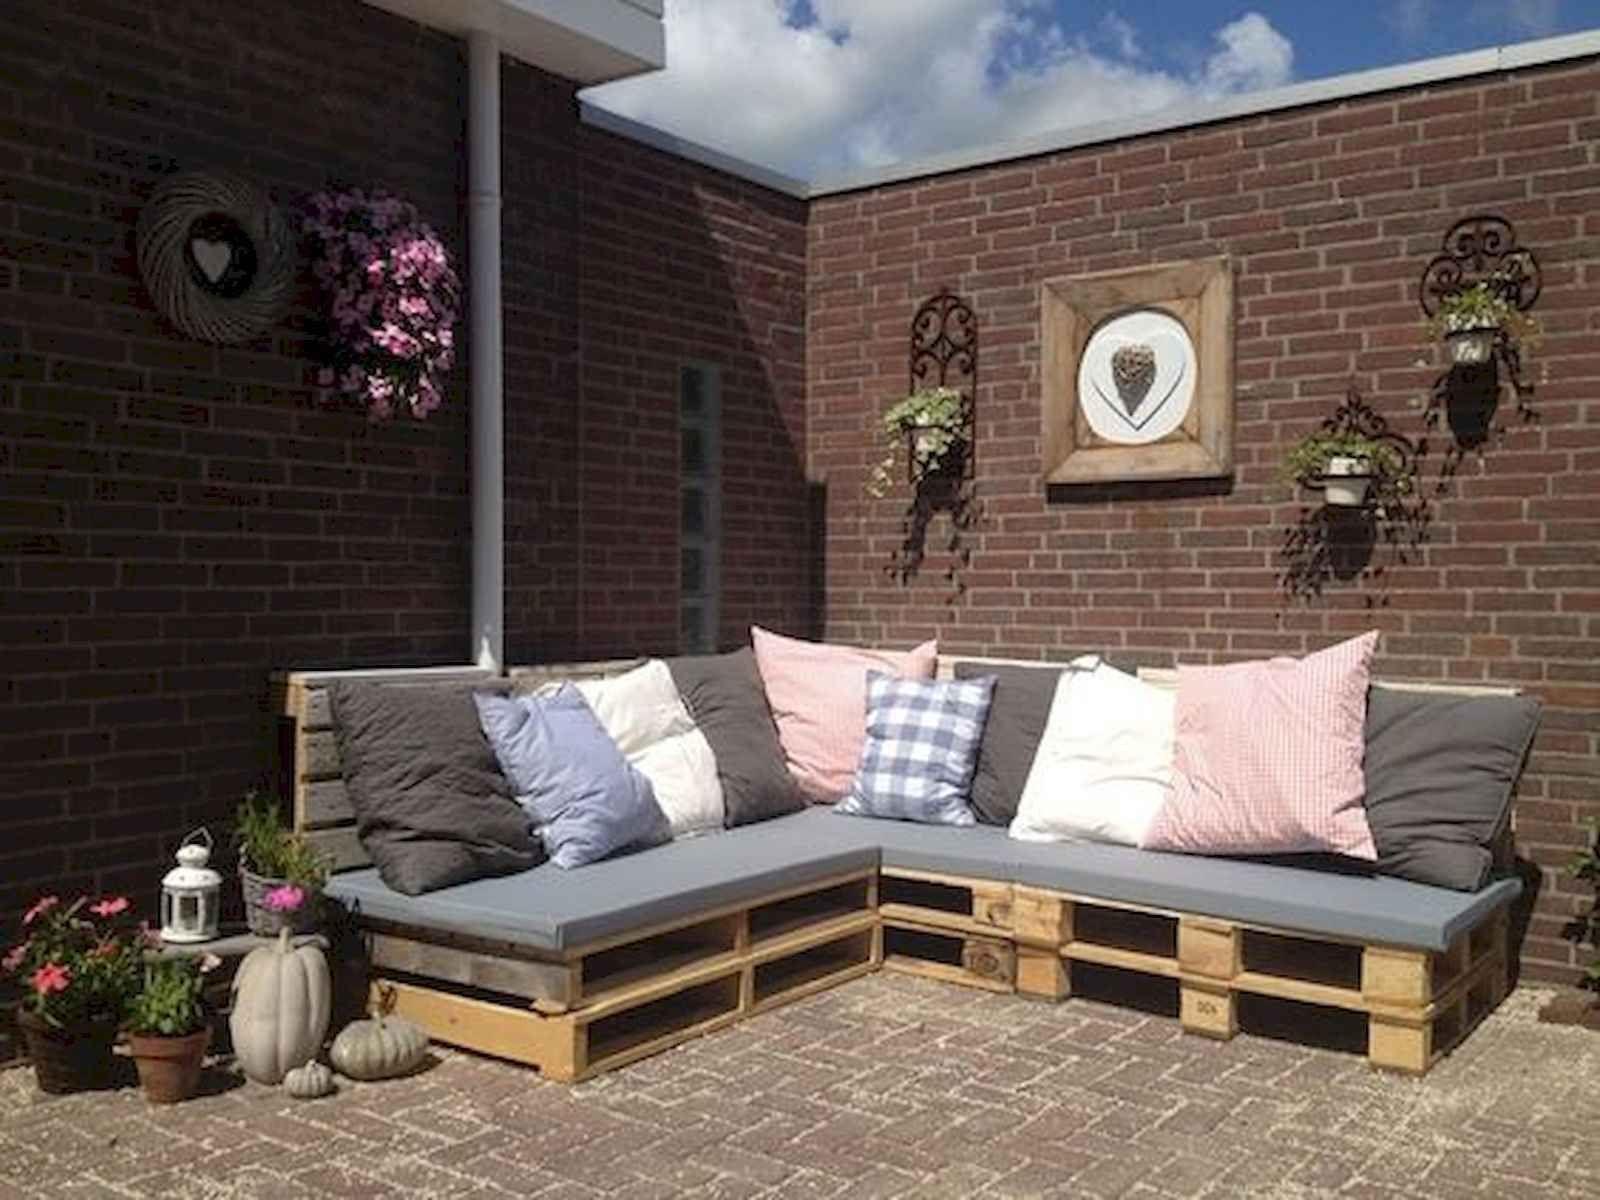 60 stunning diy projects pallet sofa design ideas 26